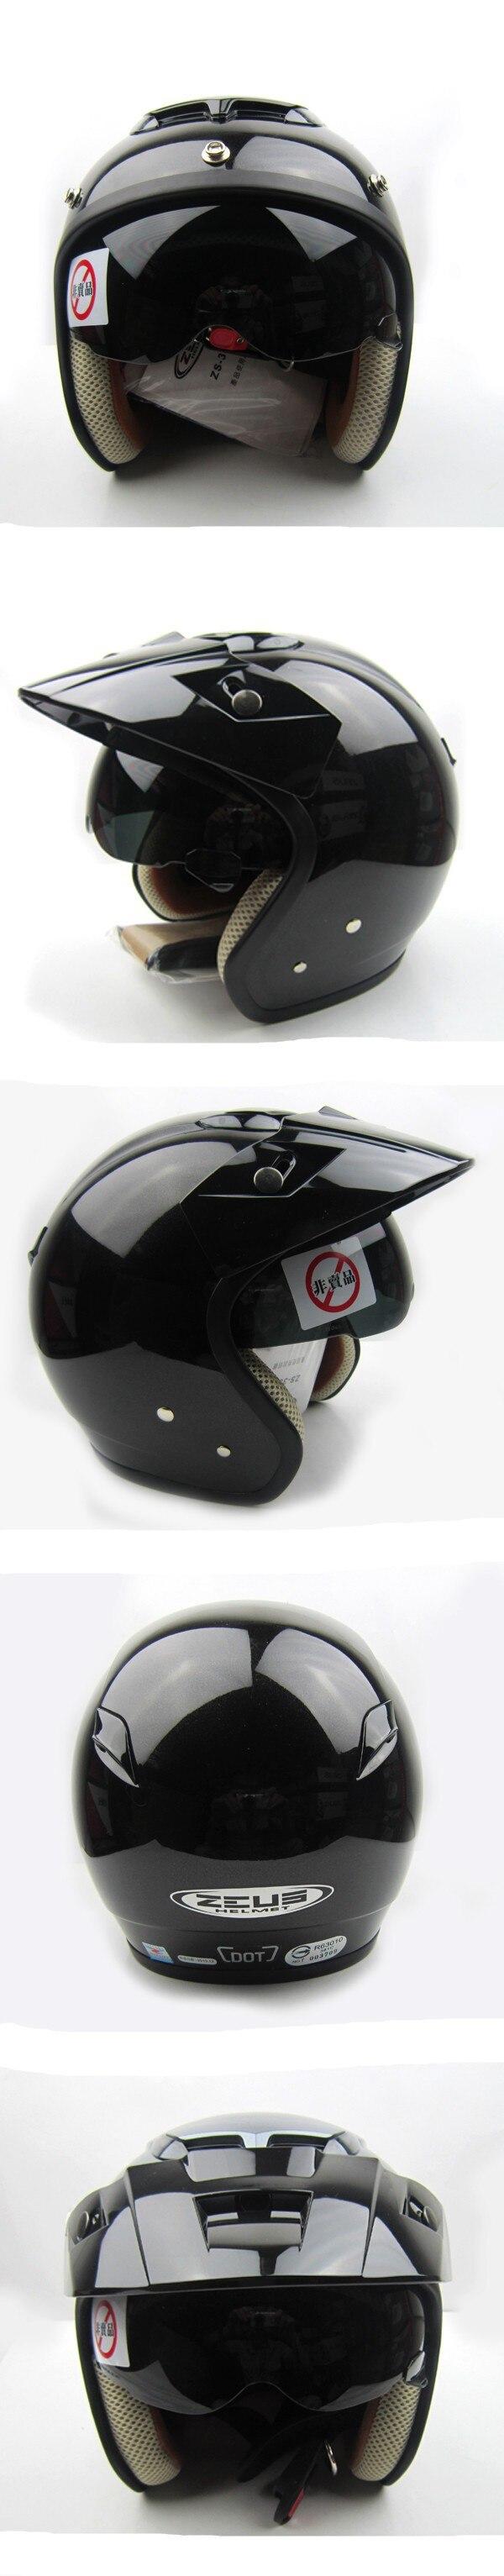 GHOST RACING Motorradjacke Abnehmbare innere Motocross Jacke mit Schutzausrüstung Armor Herren Wasserdicht Winddicht